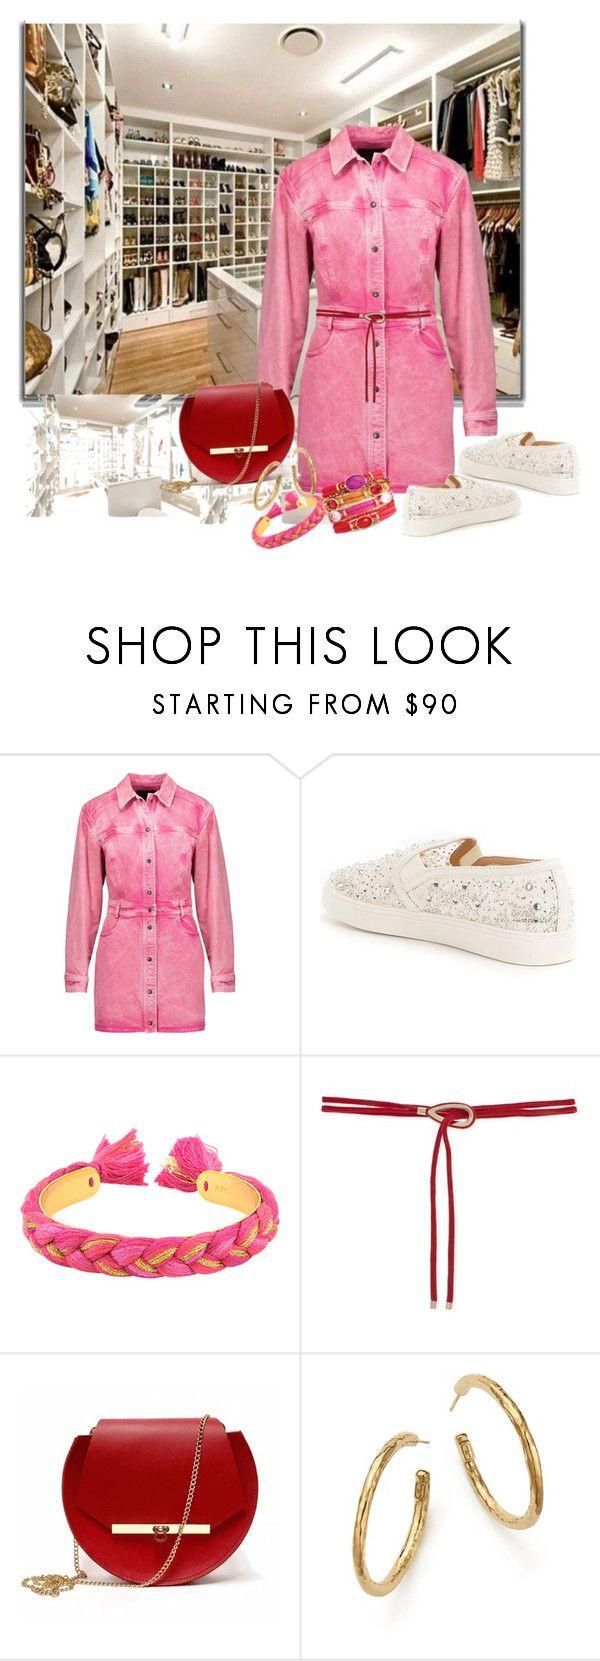 """Work Outfit...Wednesday...Pink Denim & Red"" by onesweetthing ❤ liked on Polyvore featuring Roberto Cavalli, Antonio Melani, Aurélie Bidermann, Maje, Angela Valentine Handbags and Ippolita"